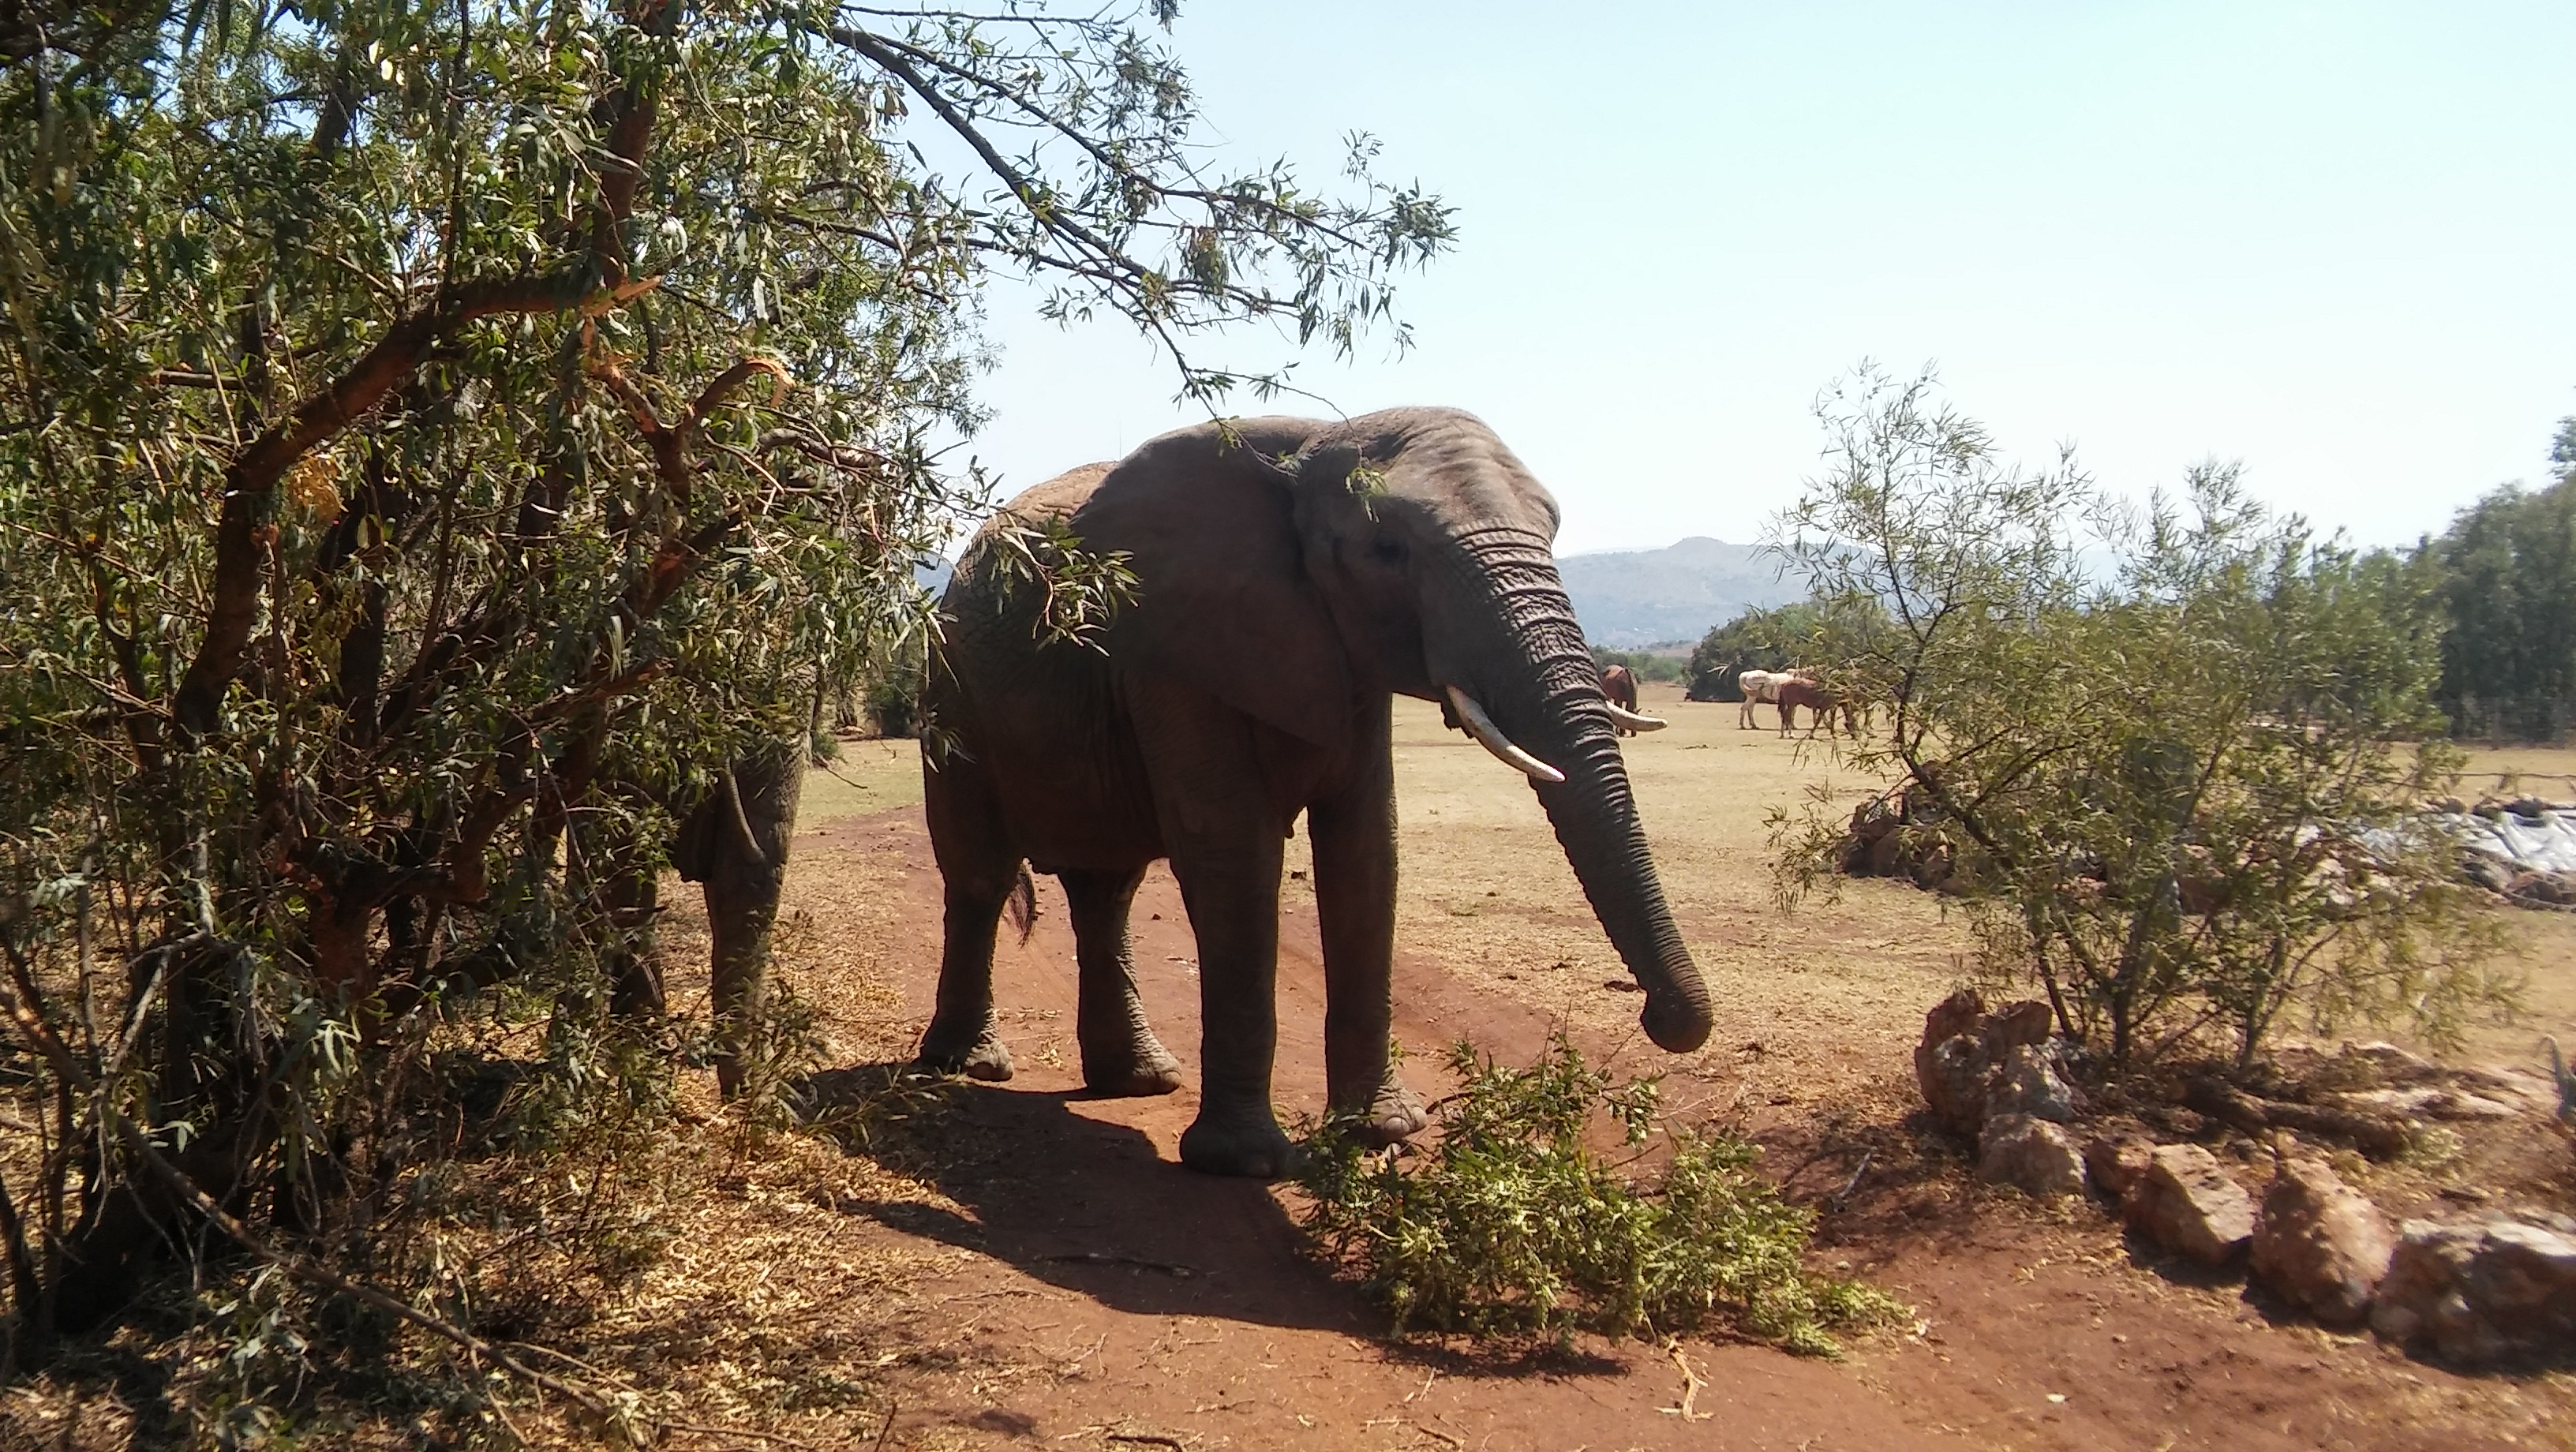 Elephant Walking Safari in Johannesburg South Africa   Safari Day Tours